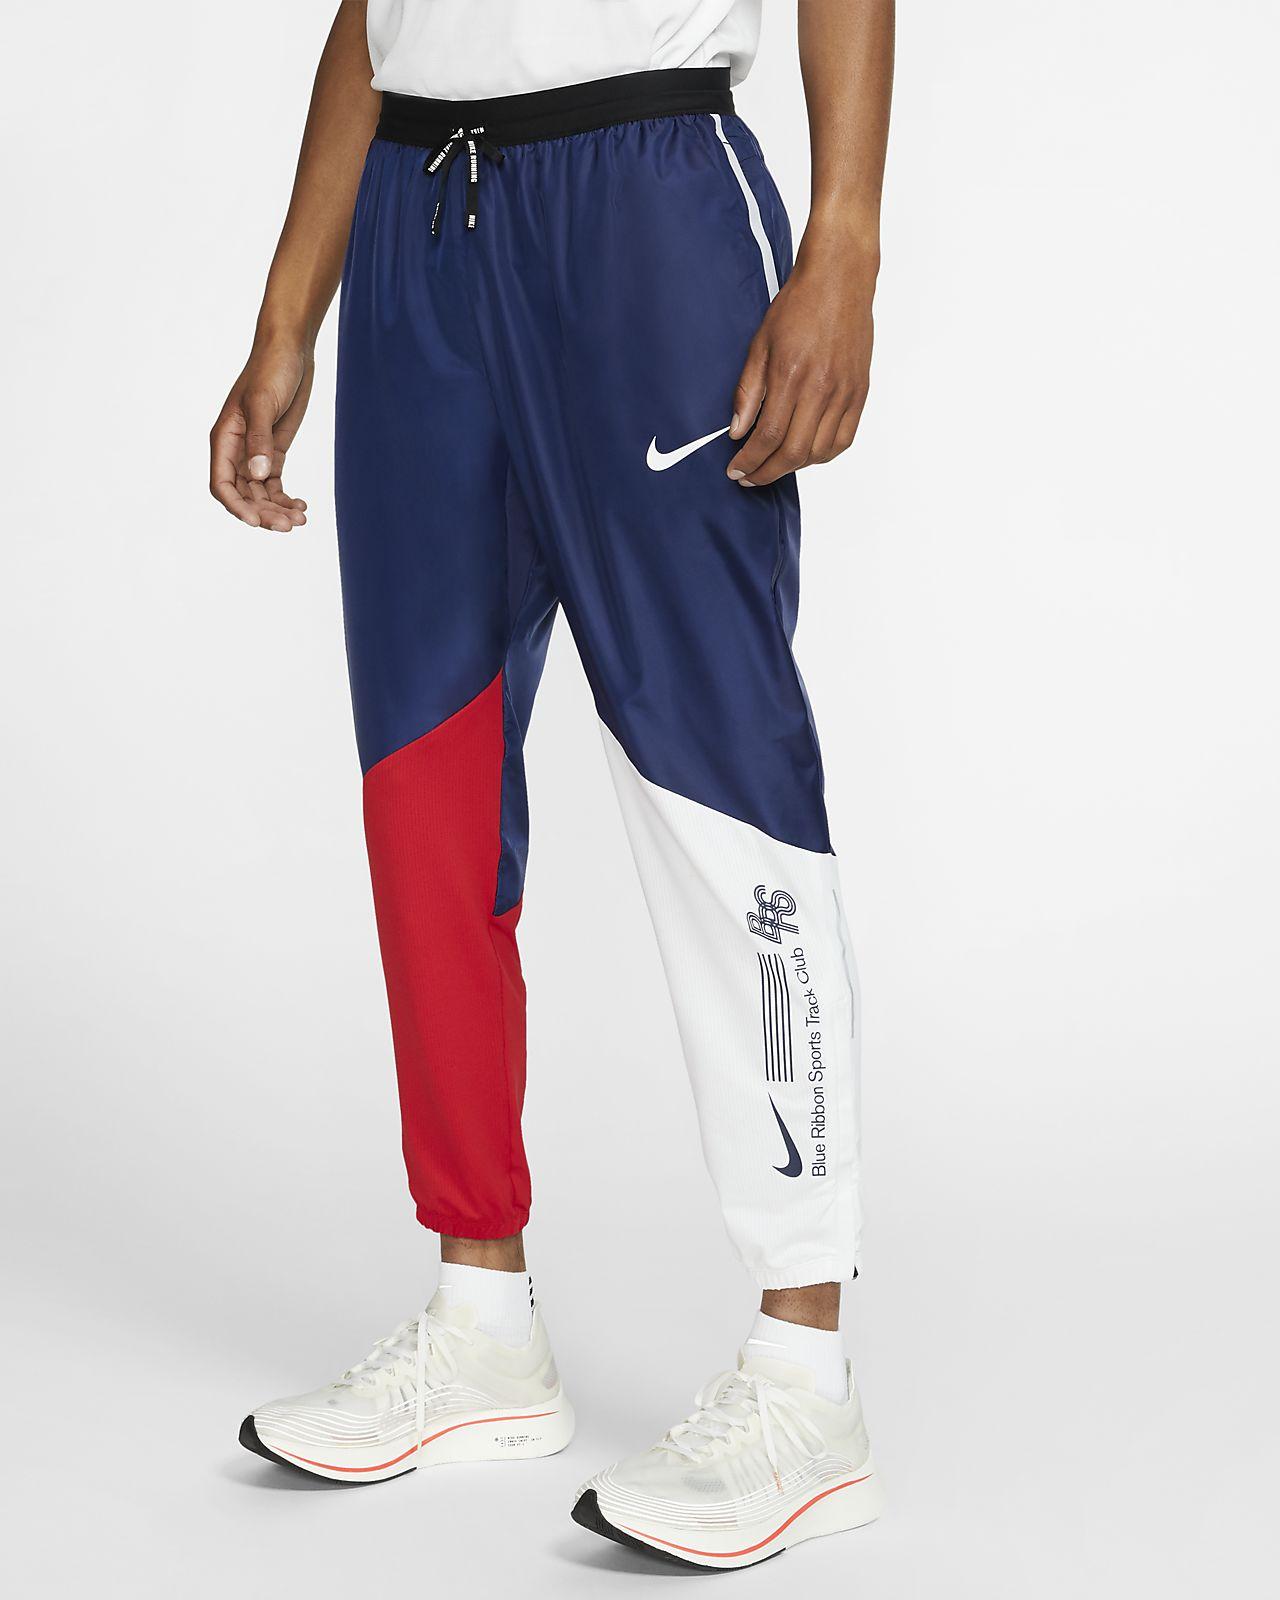 Pantalon de survêtement de running Nike BRS